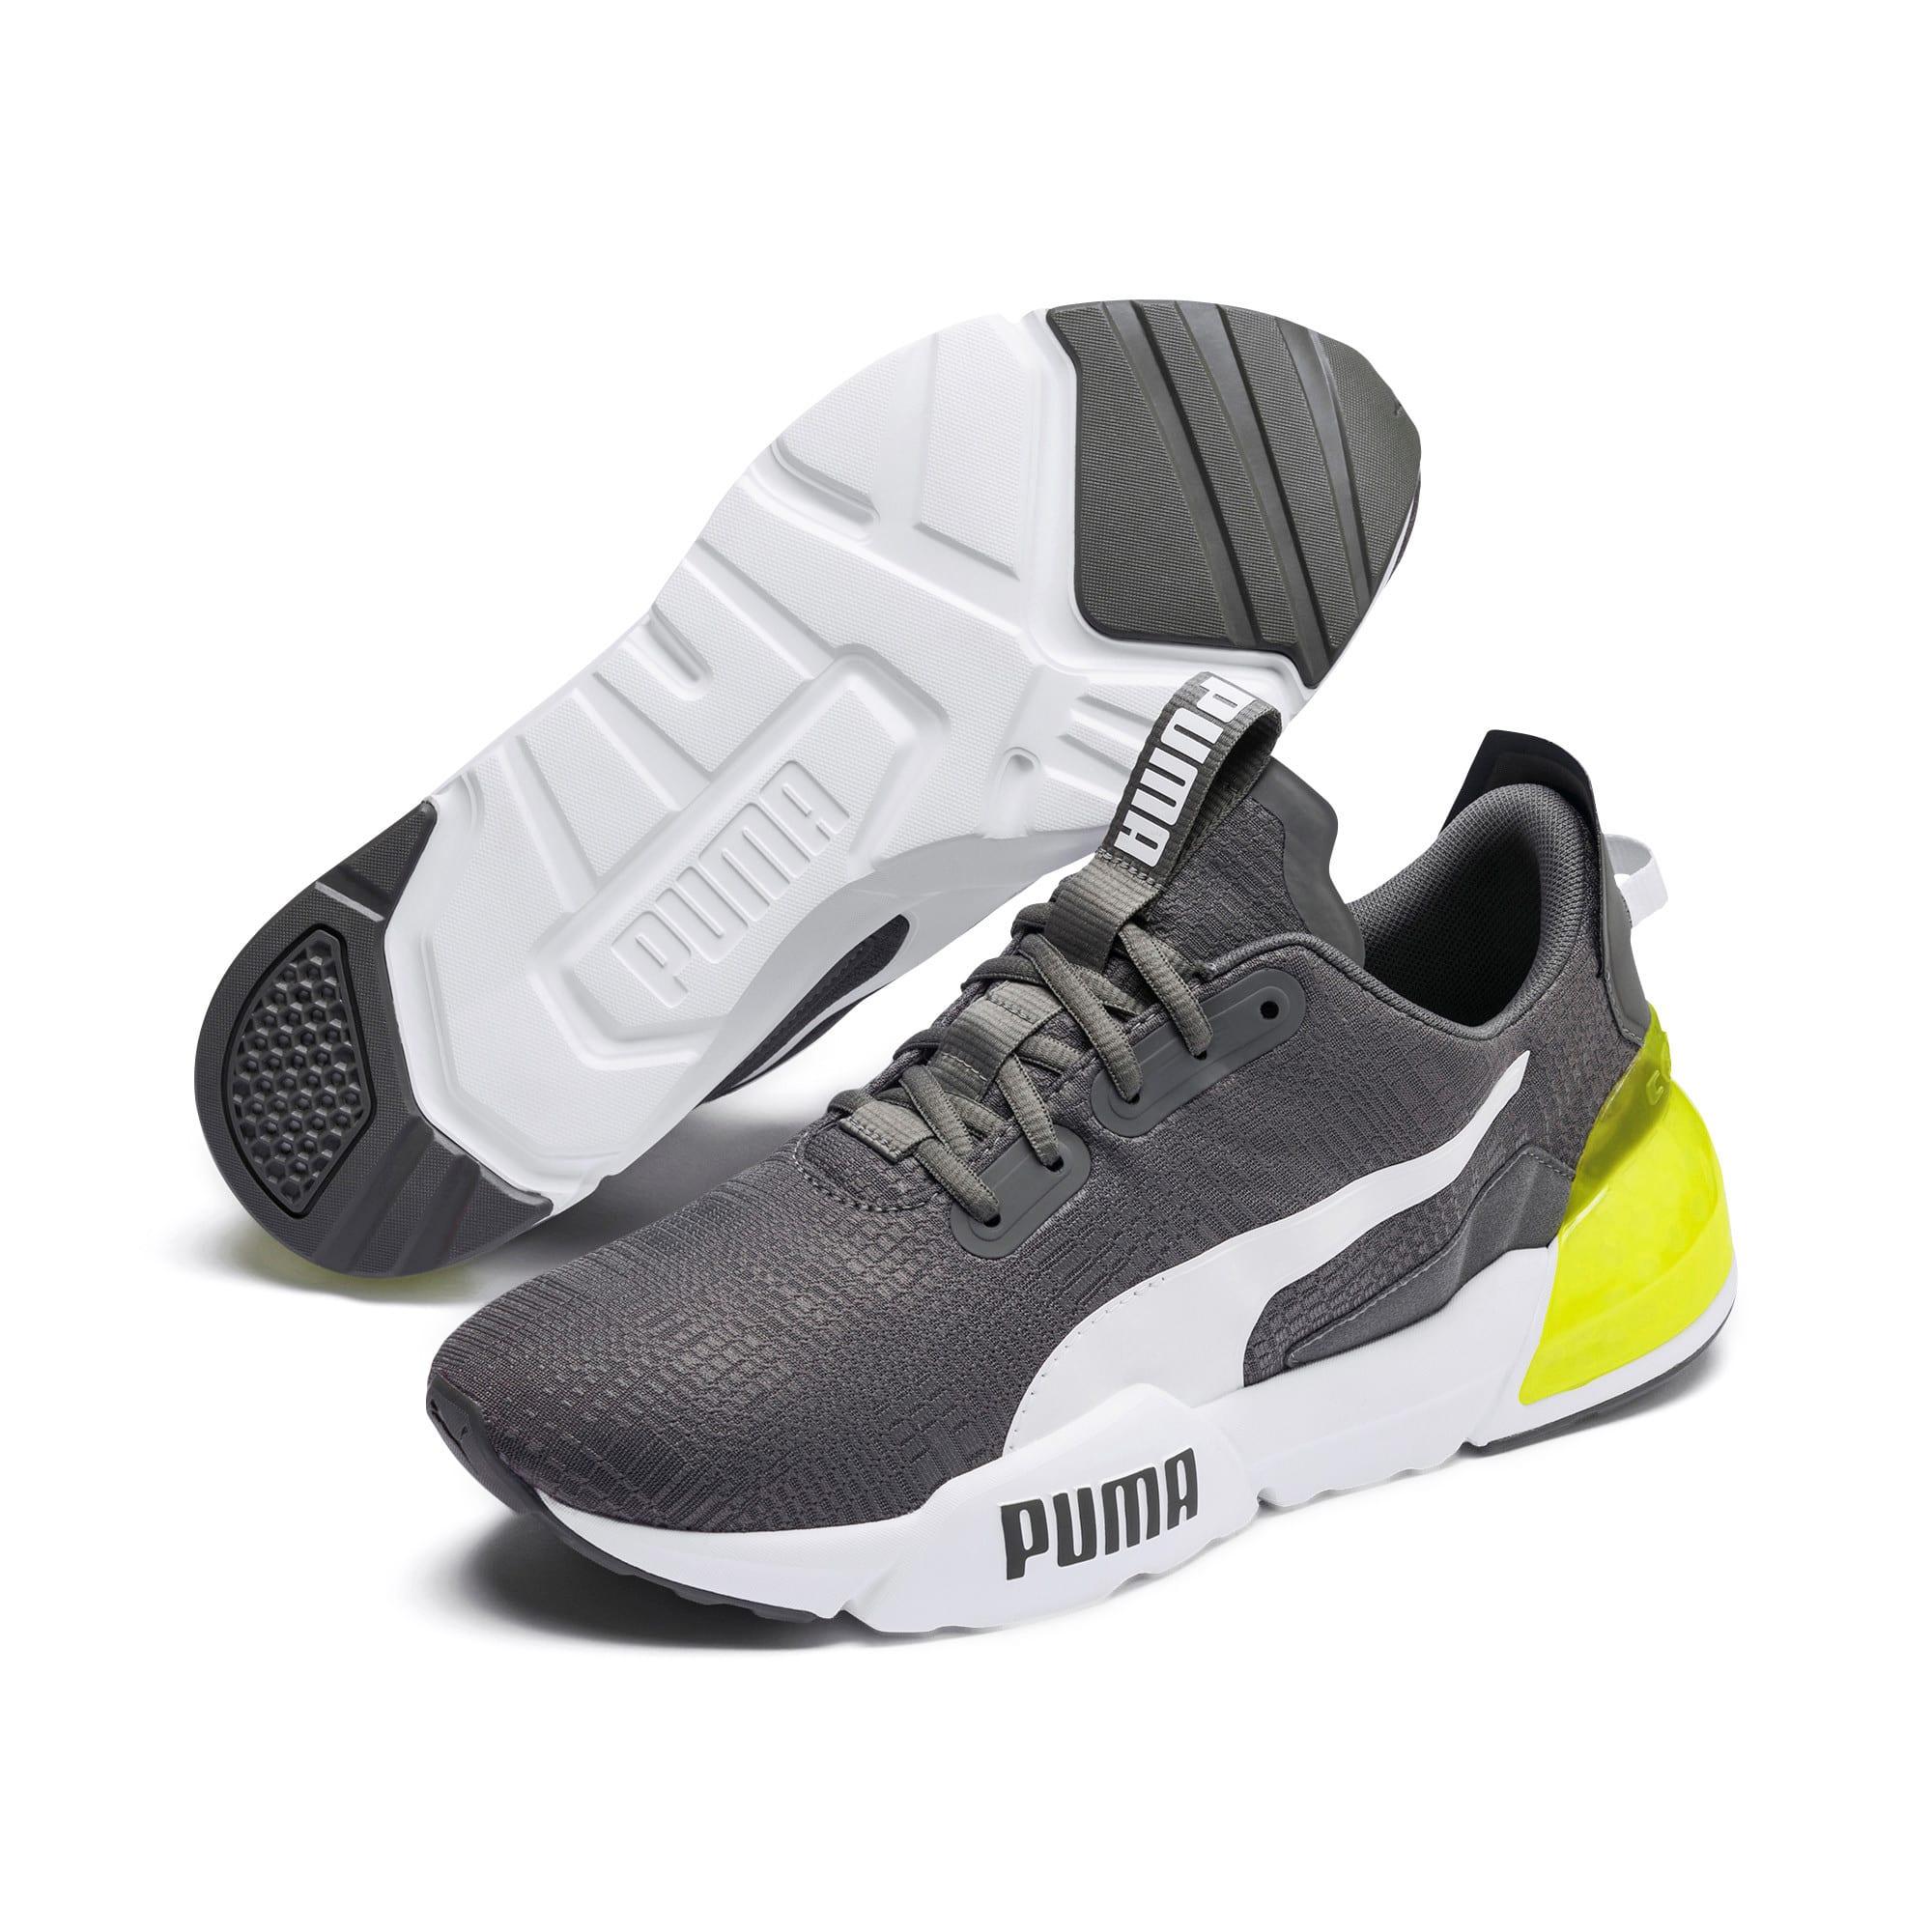 Thumbnail 2 of CELL Phase Lights Men's Training Shoes, CASTLEROCK-Yellow Alert, medium